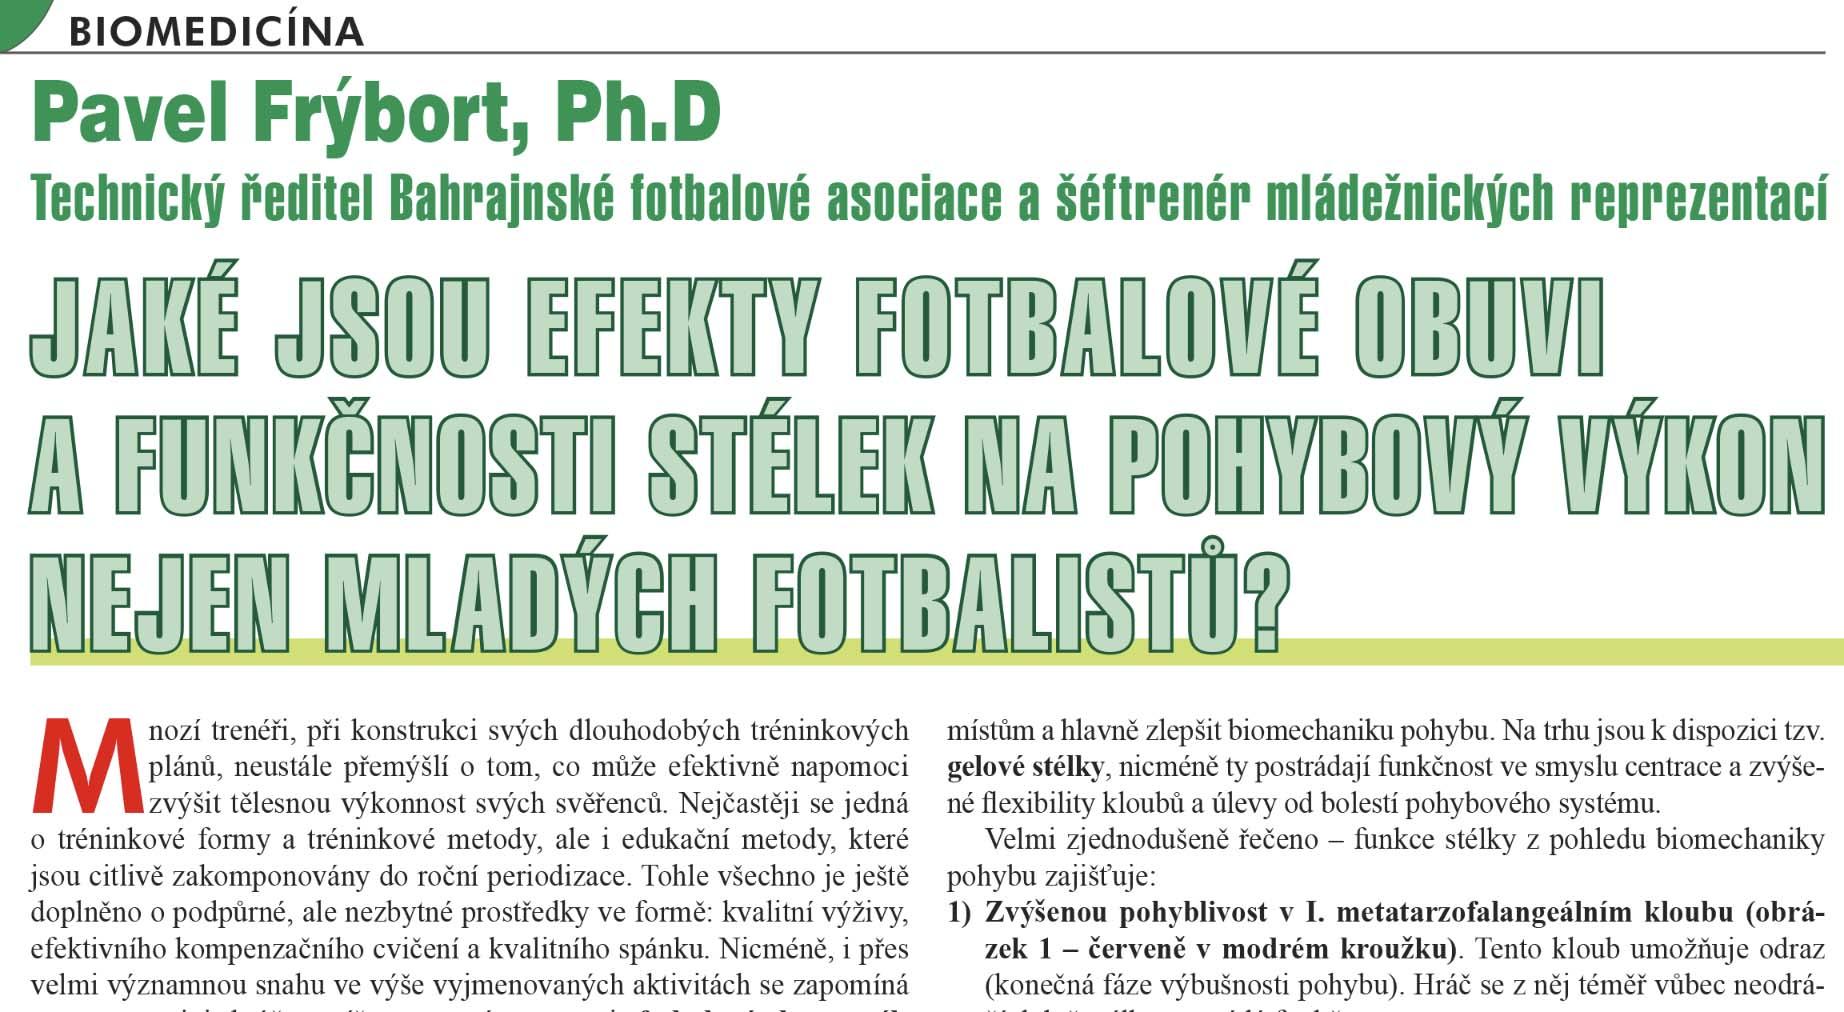 Efekty stélek ve fotbalové obuvi - Fotbal a trénink 2017/2